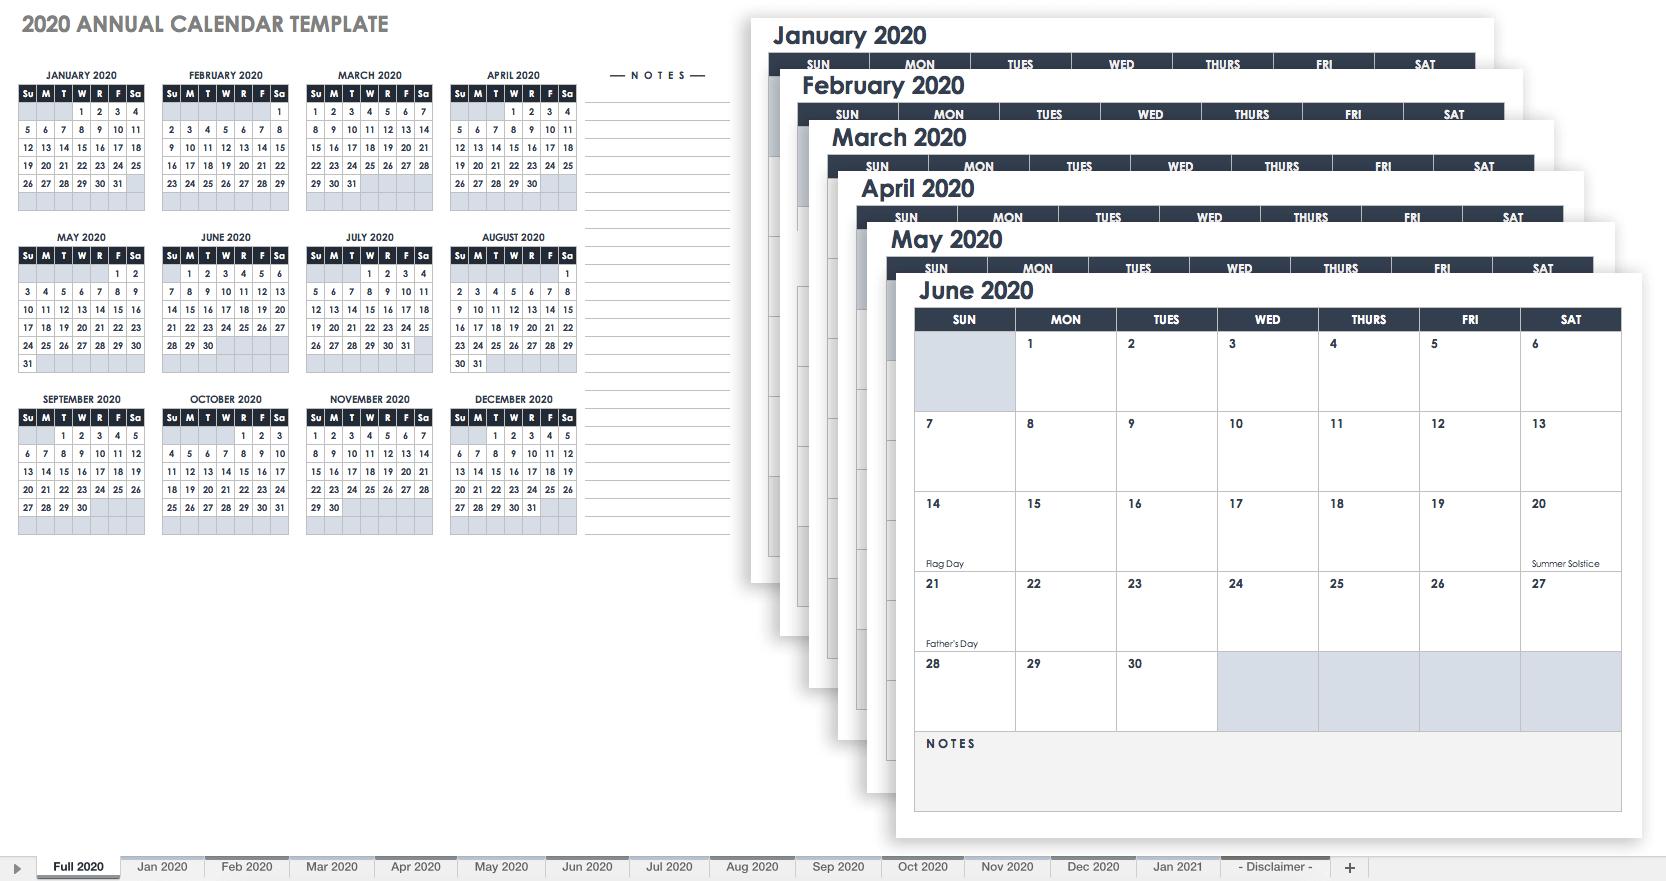 Free, Printable Excel Calendar Templates For 2019 & On   Smartsheet 5 Column Calendar 2019